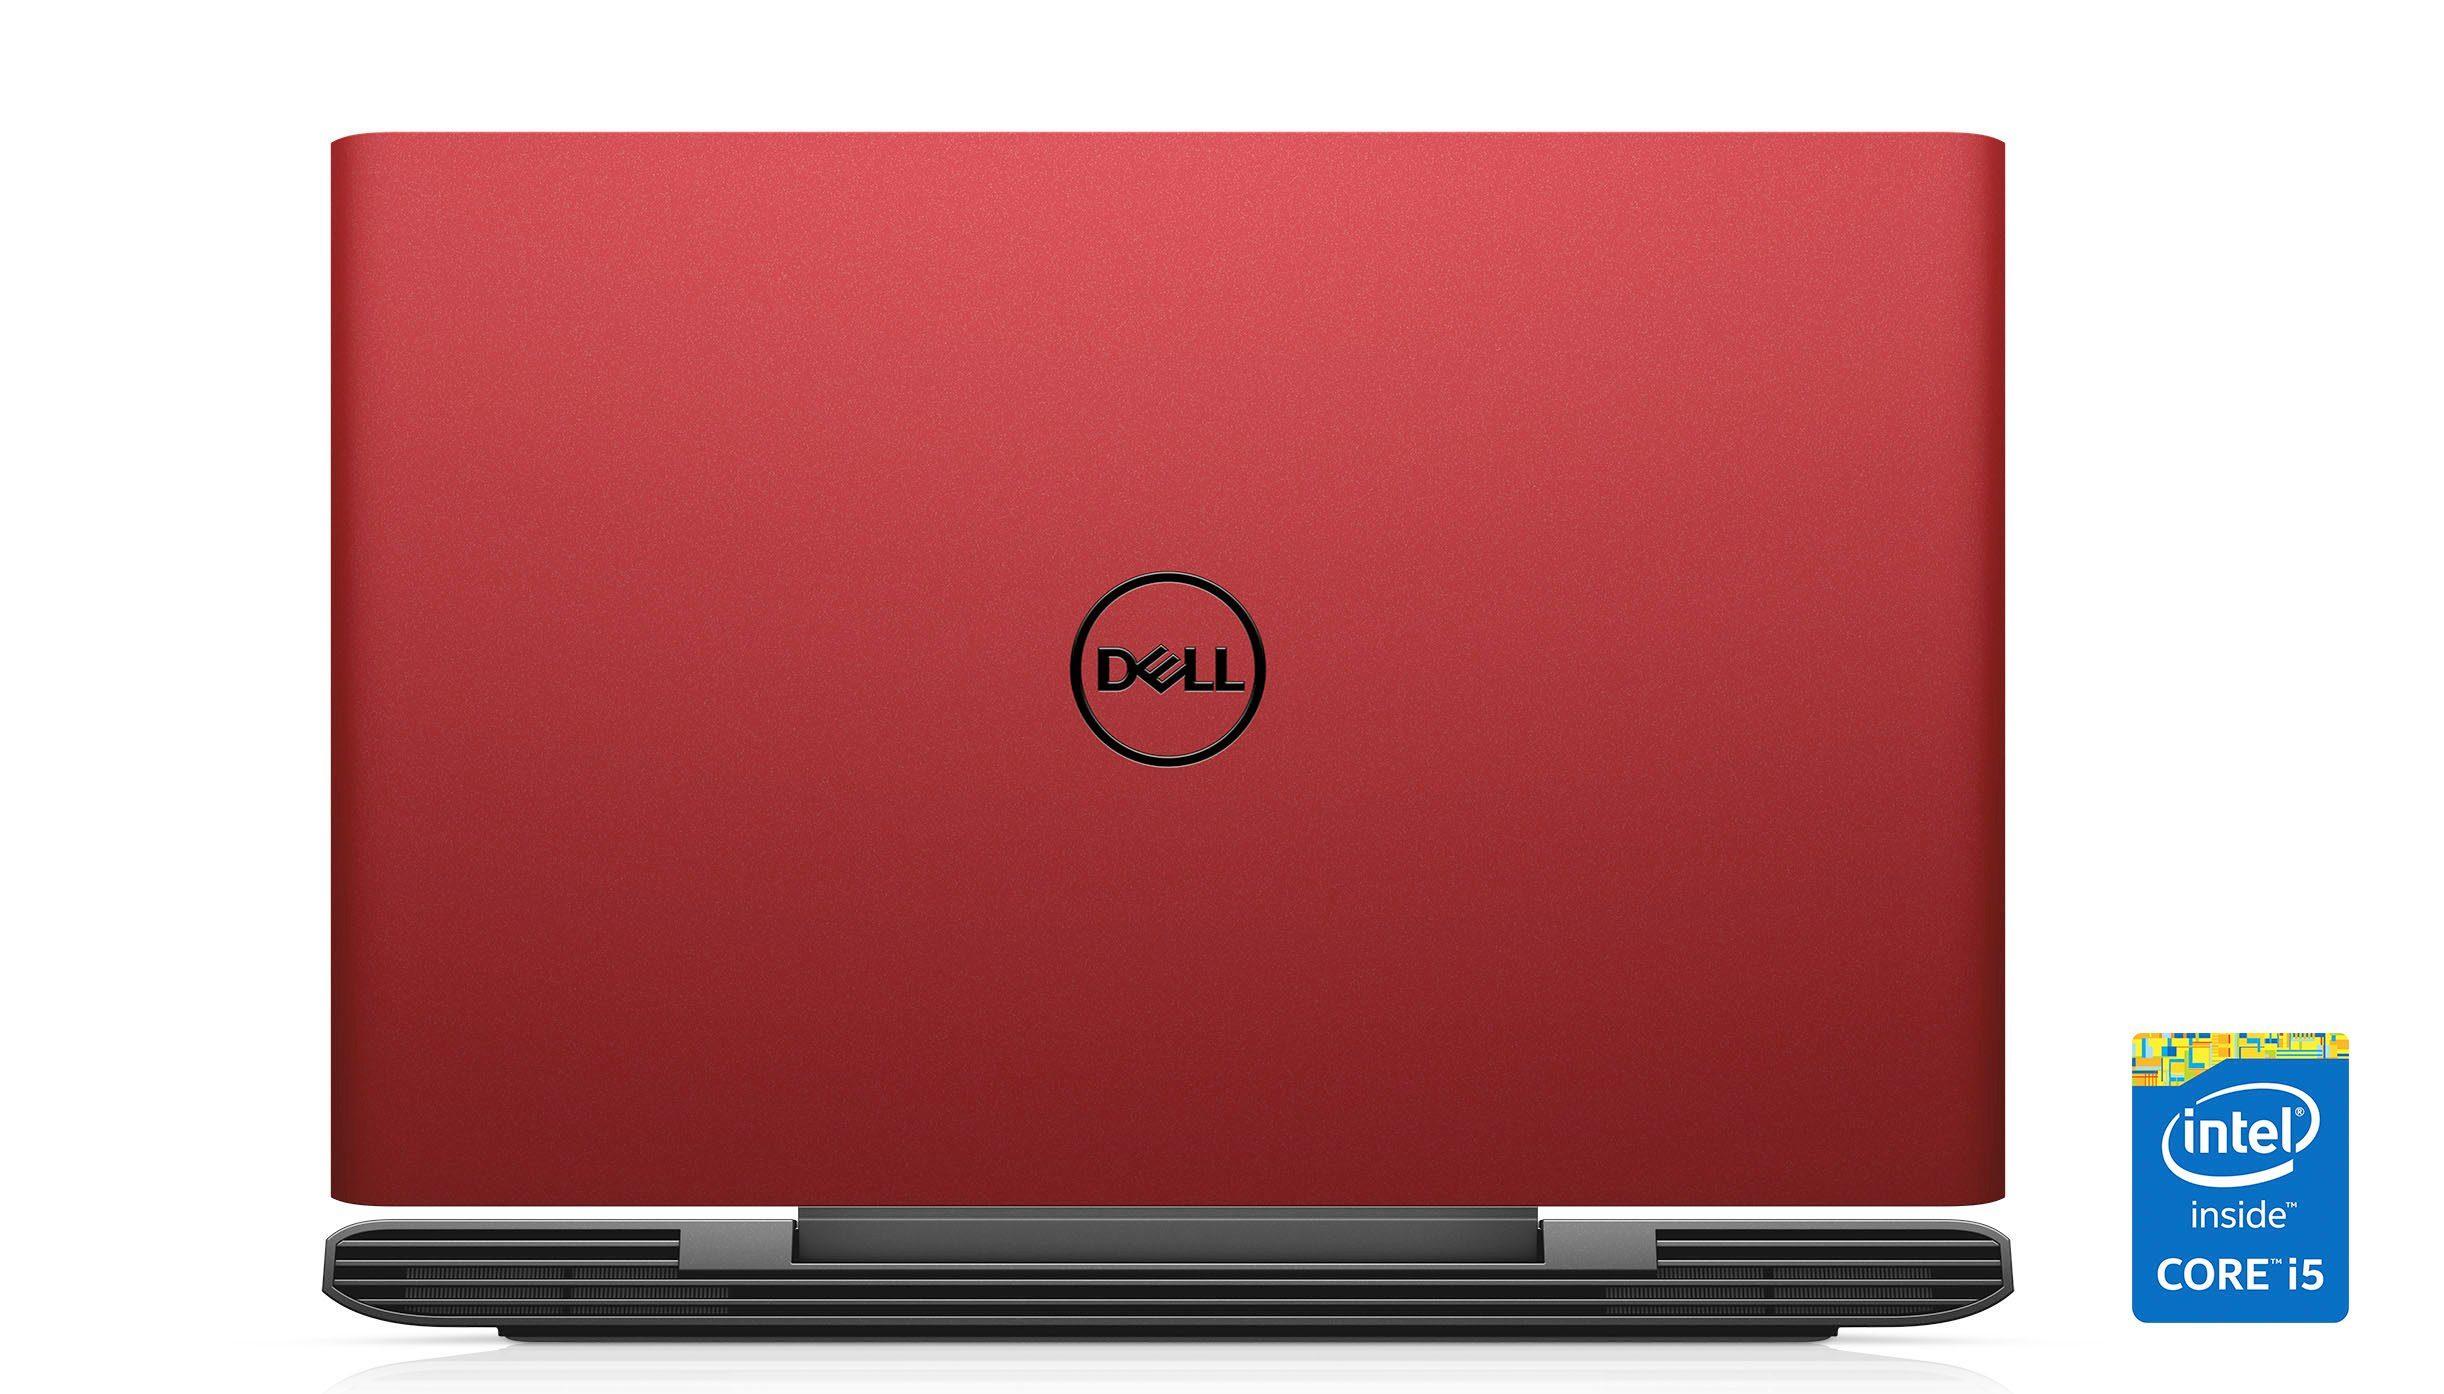 Dell EMC Notebook/Ultrabook »INSPIRON15 7577 BACK I5-7300«